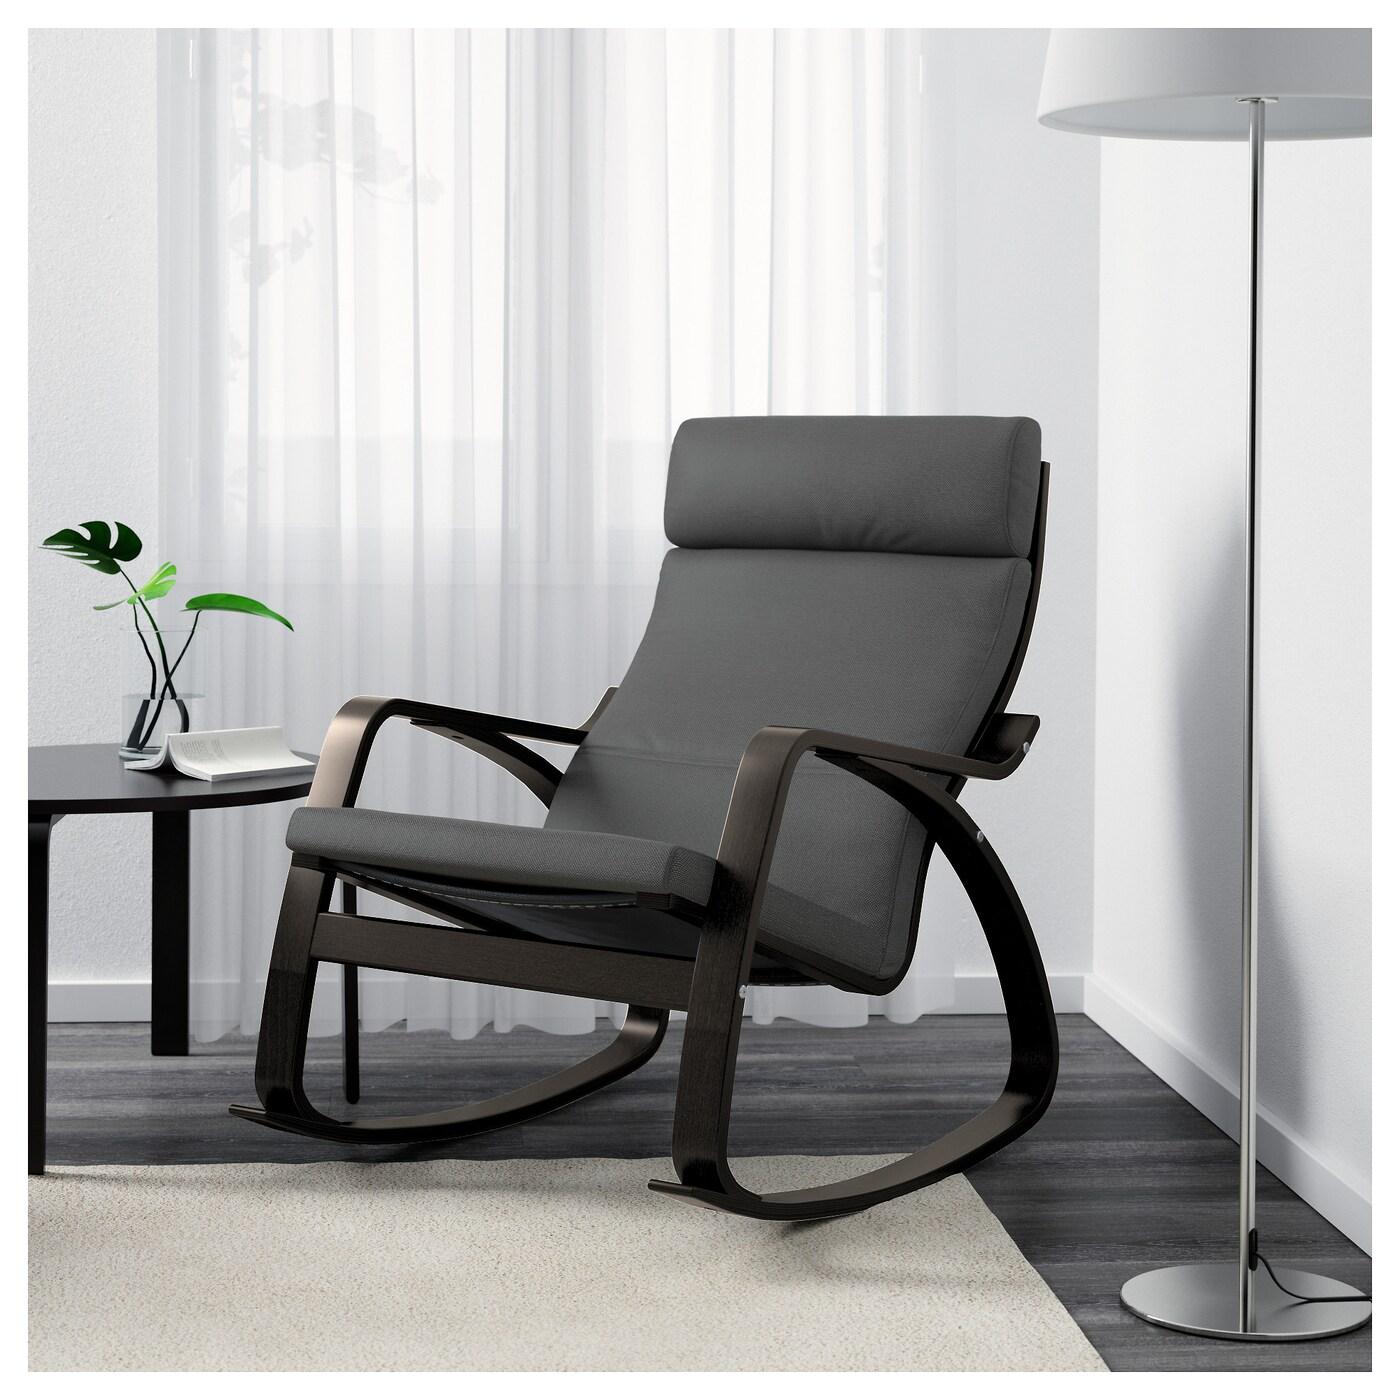 po ng fauteuil bascule brun noir finnsta gris ikea. Black Bedroom Furniture Sets. Home Design Ideas